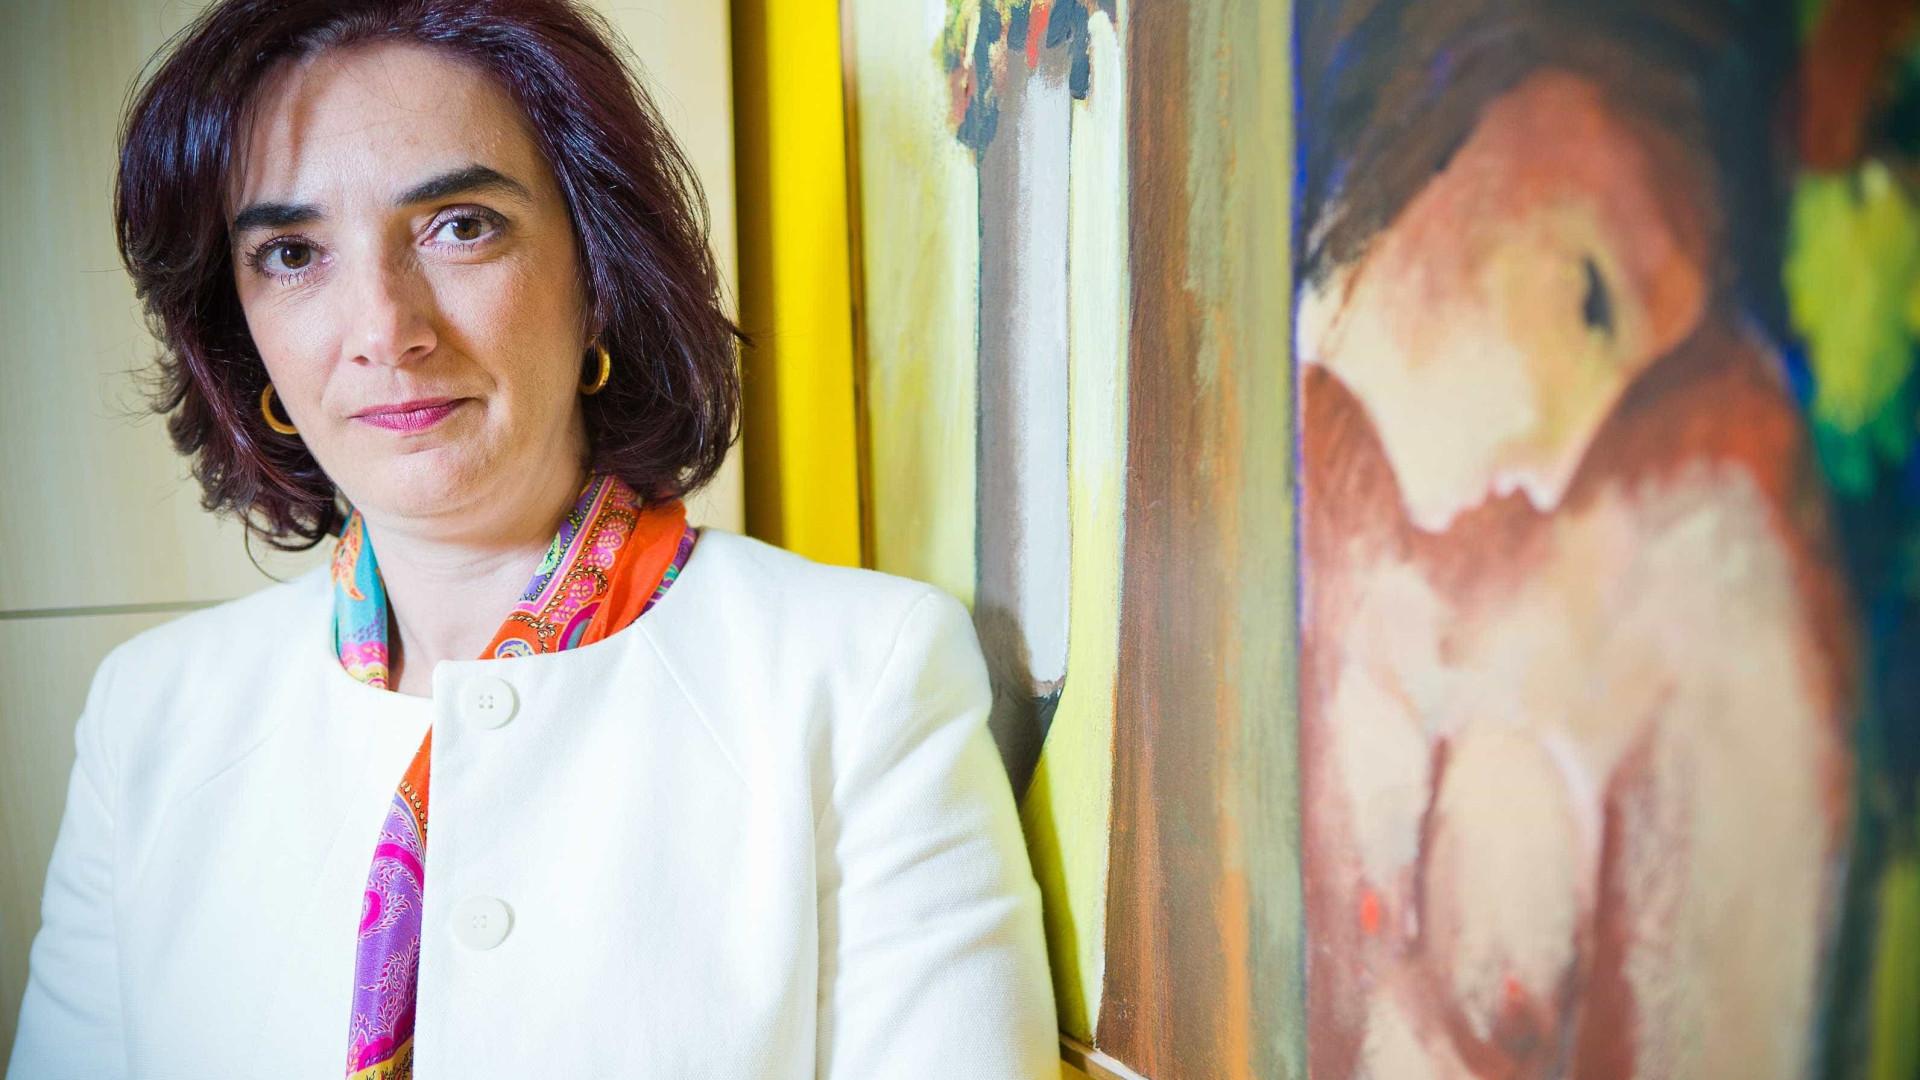 Presidente felicita cientista Elvira Fortunato por prémio polaco